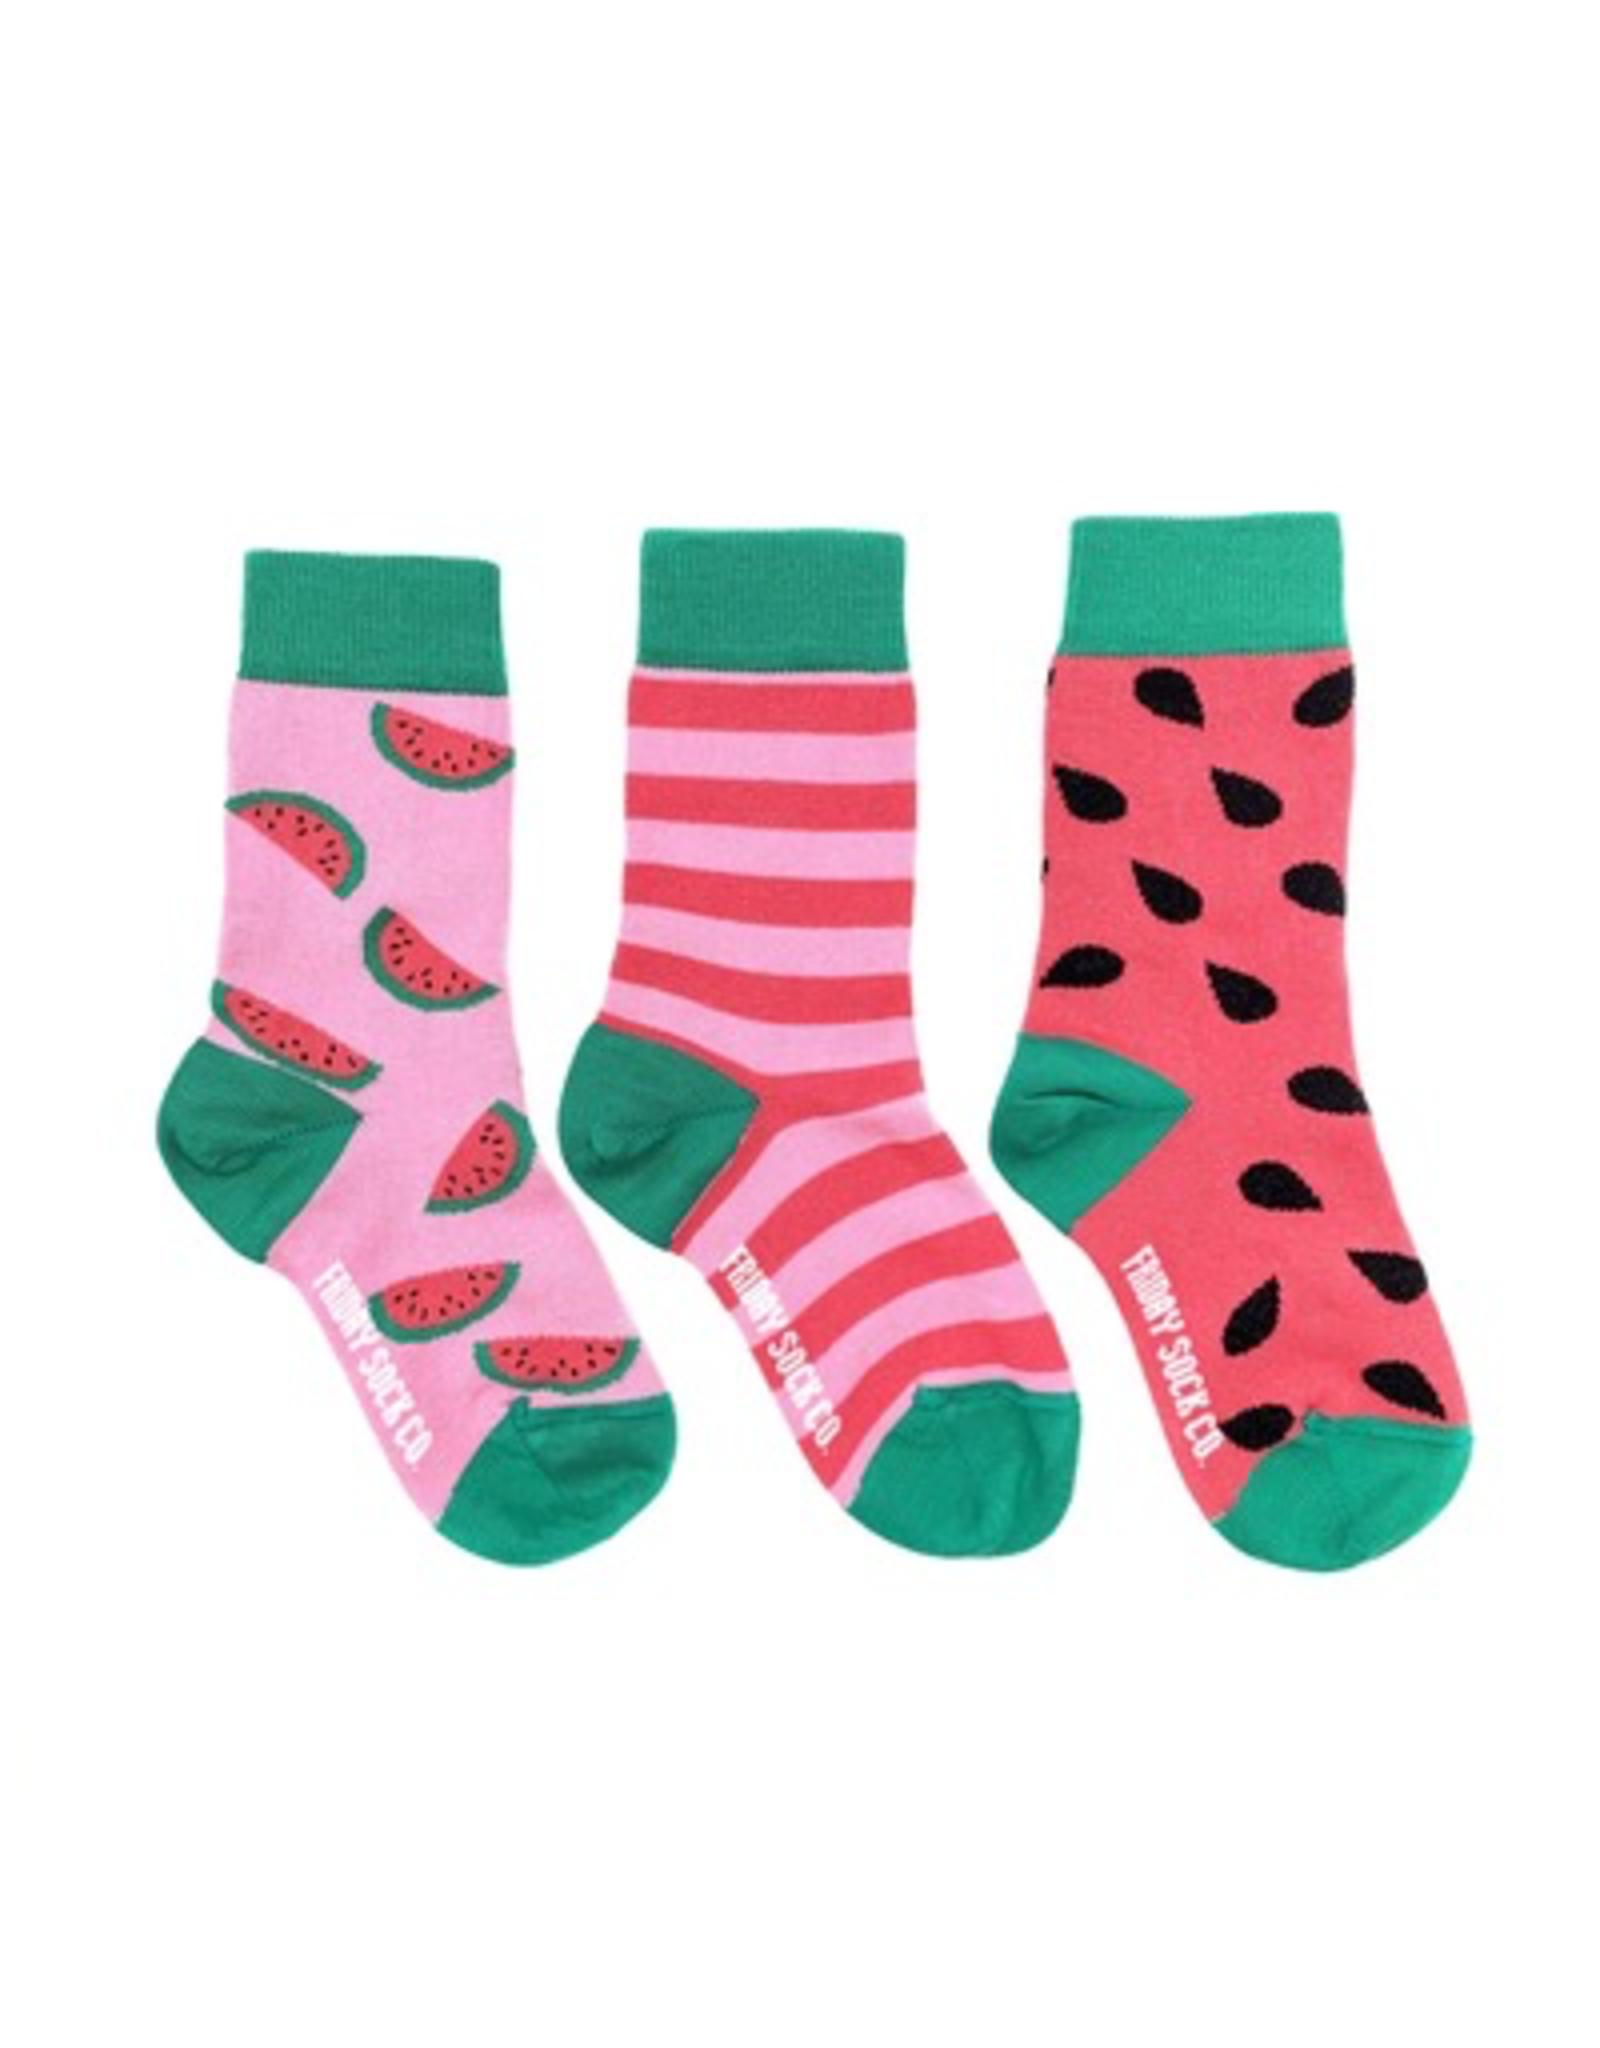 Friday Sock Co Friday Sock Co Watermelon Kids Socks-Age 5-7